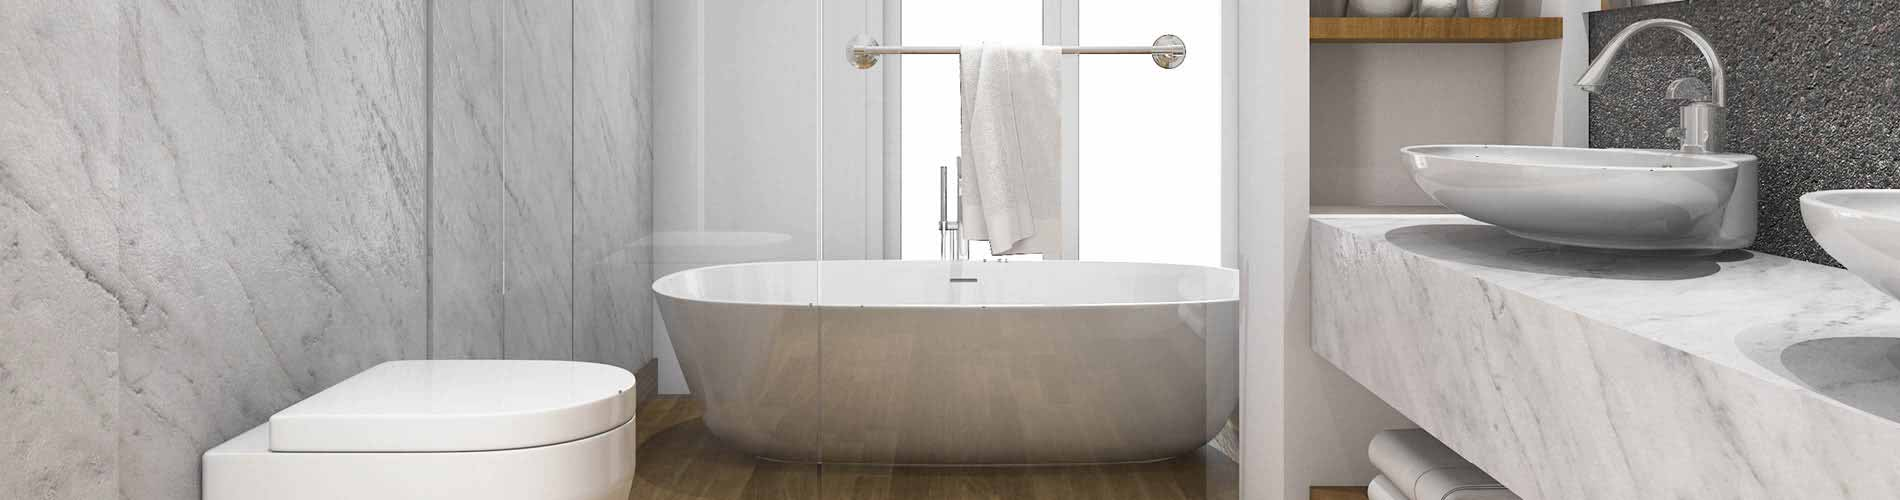 Bathroom Remodeling by Flooring USA in Stuart